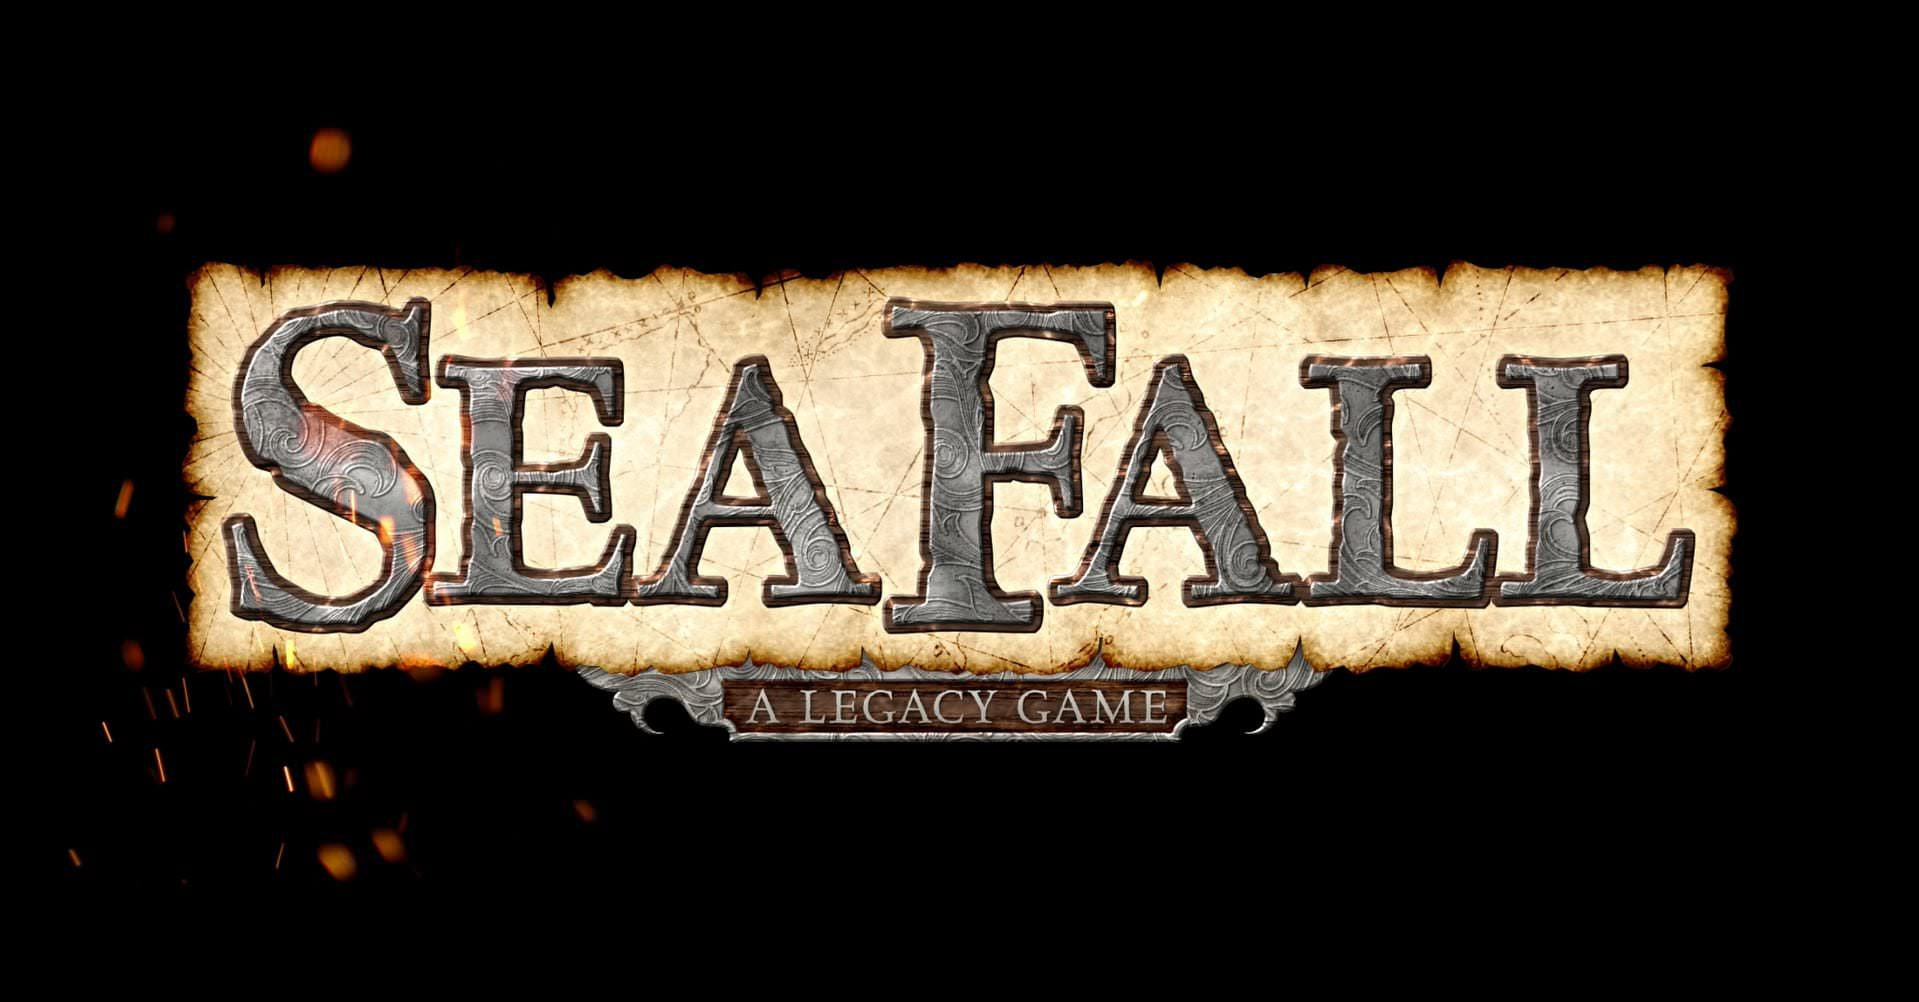 Ein Brettpielkoloss namens Seafall